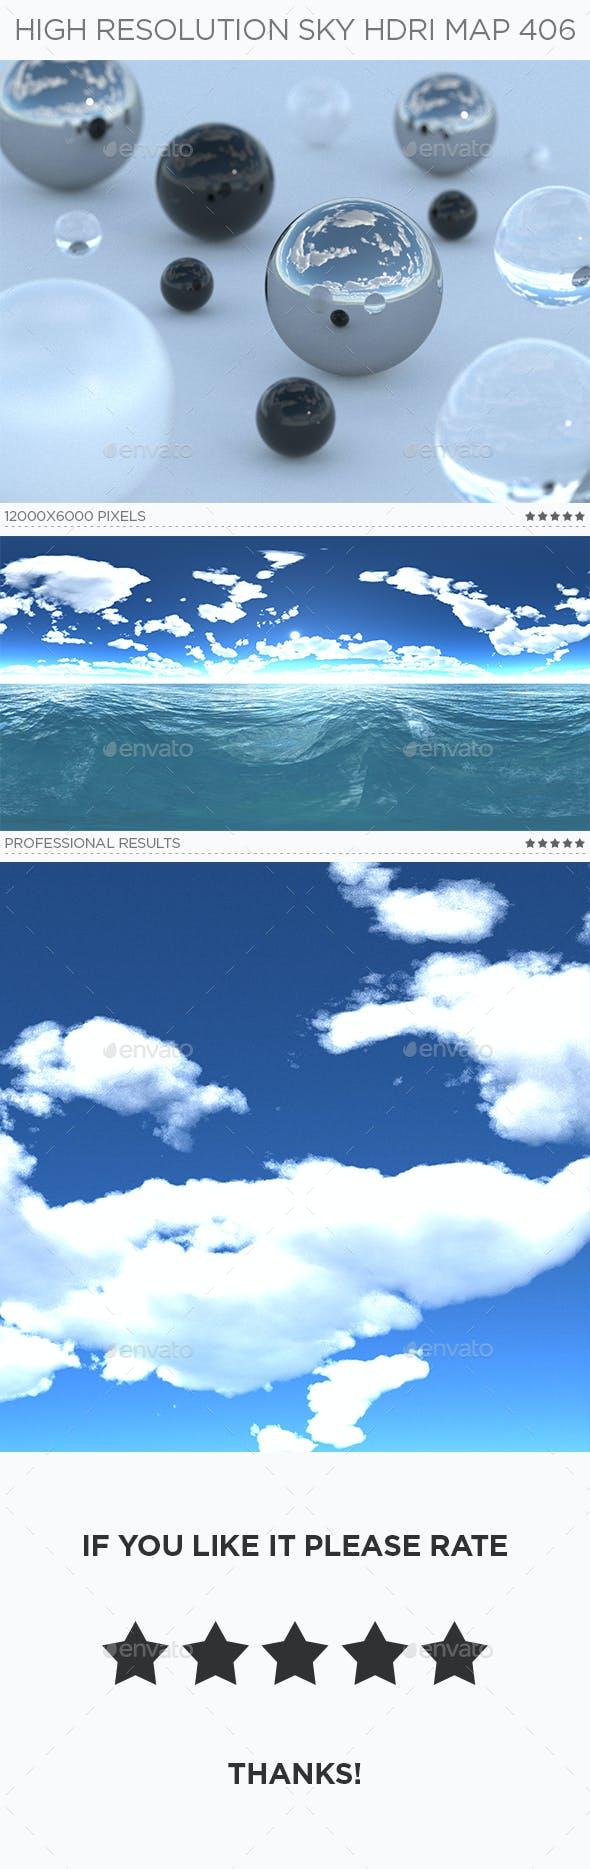 High Resolution Sky HDRi Map 406 - 3DOcean Item for Sale